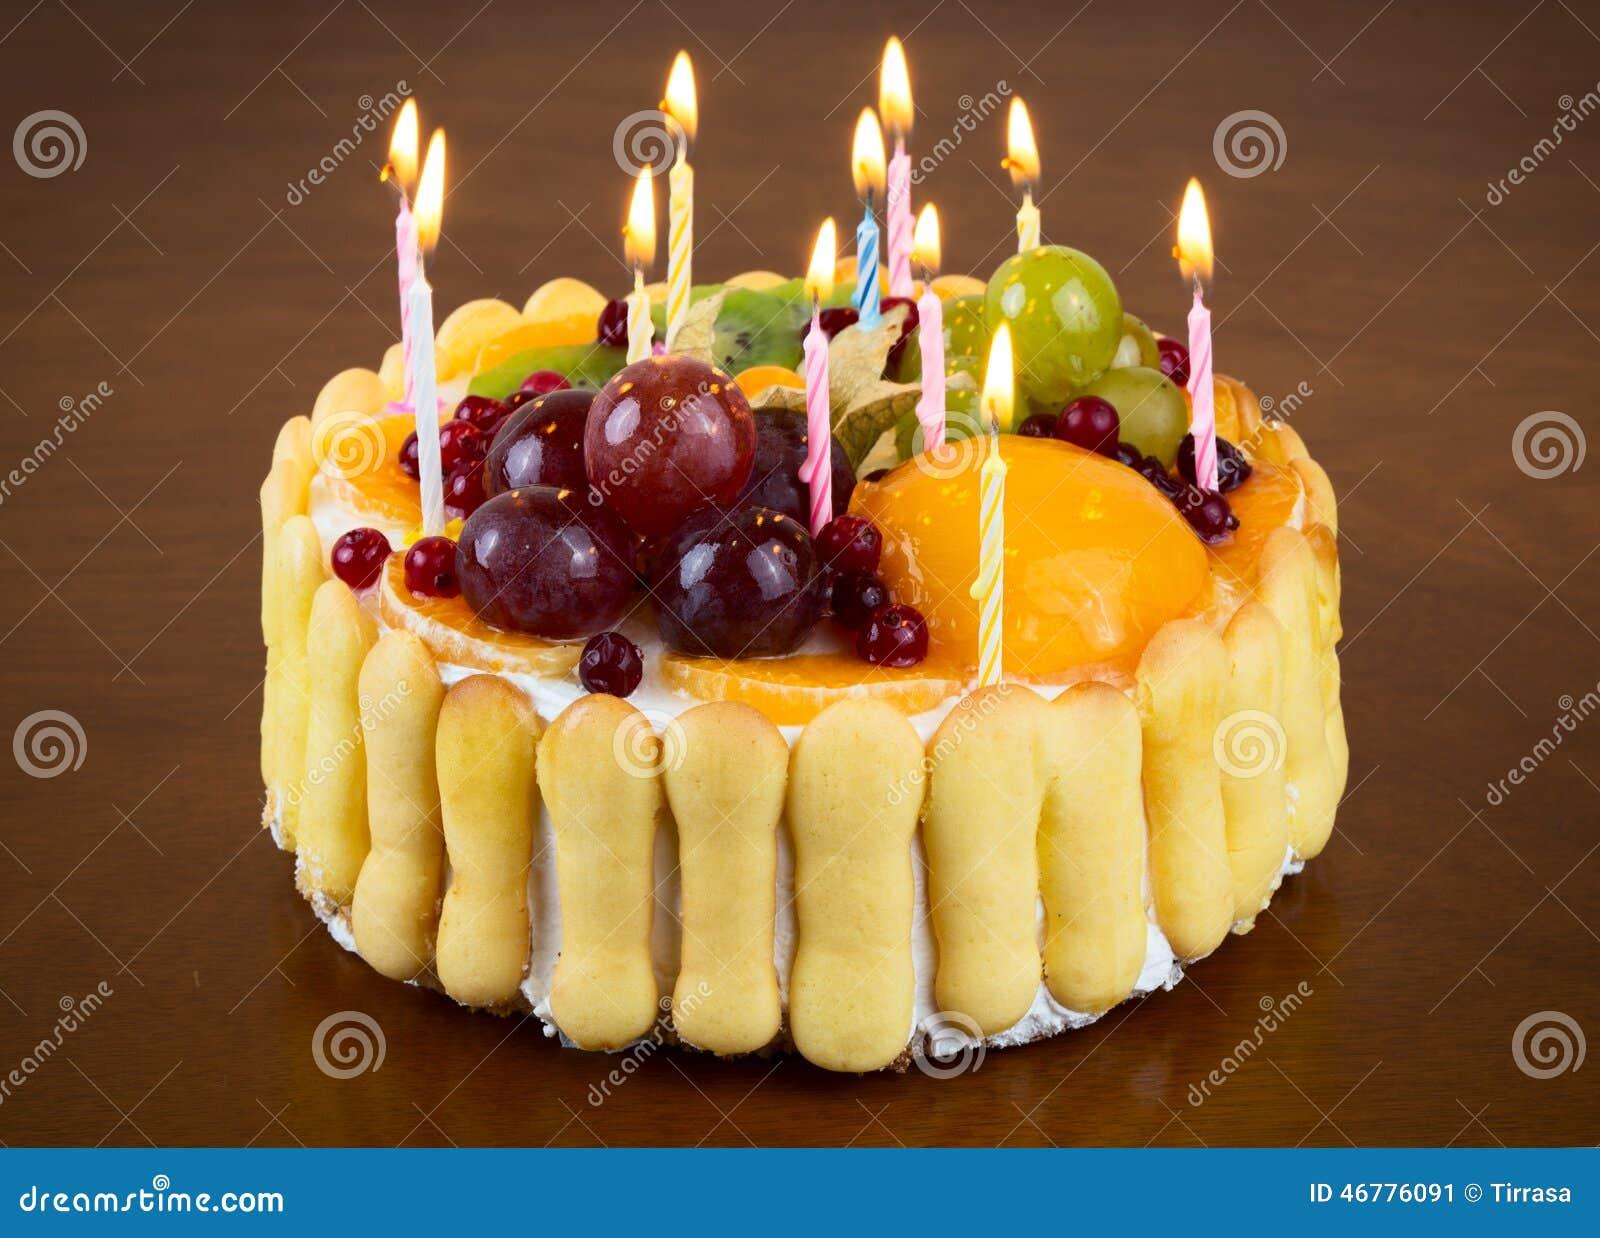 Birthday Cake Stock Image Of Food Space Light